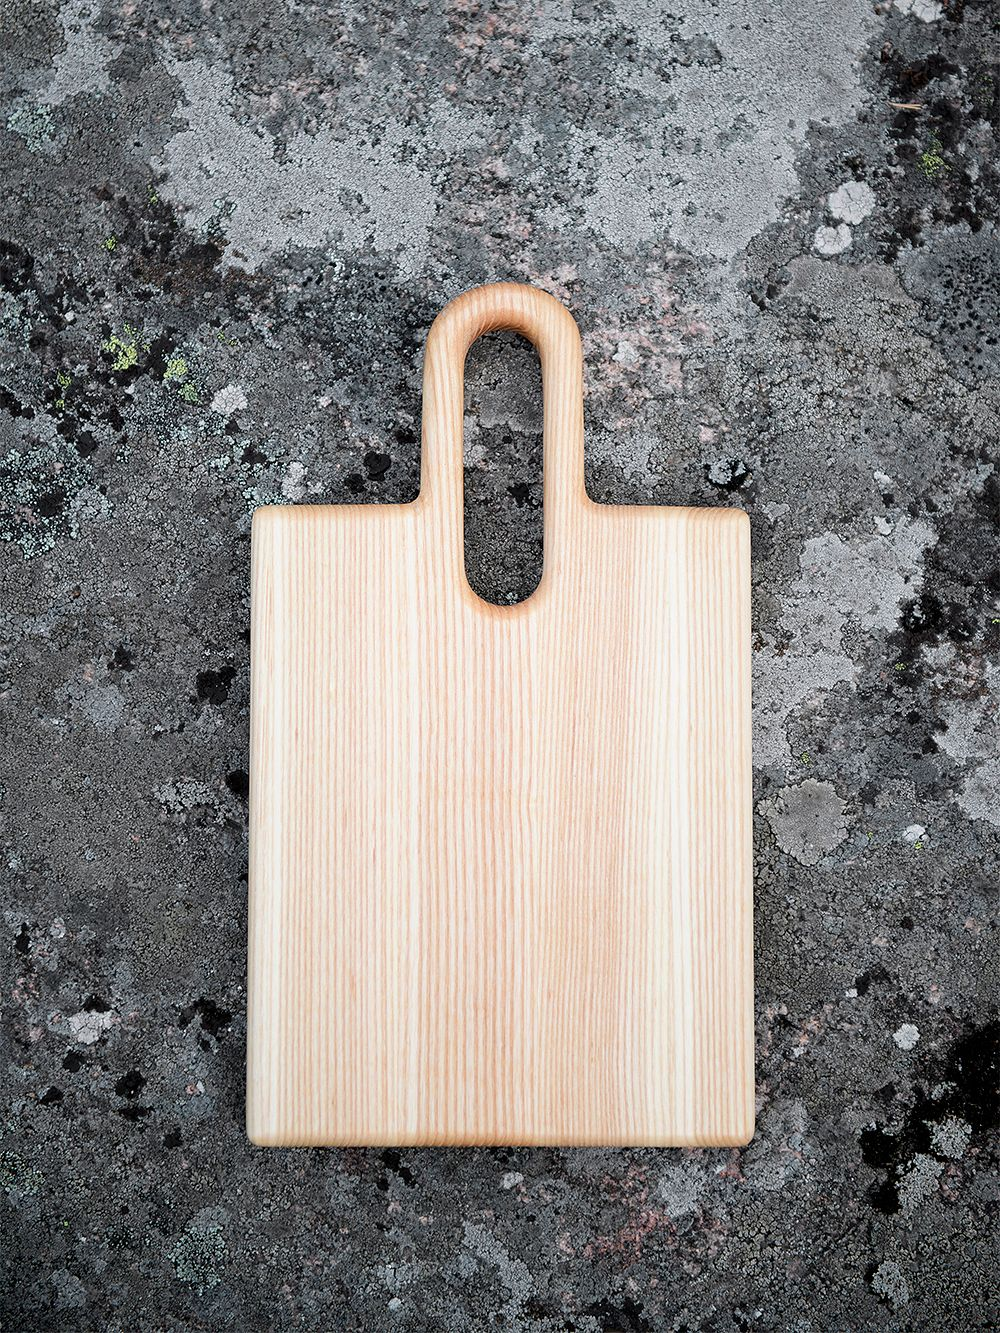 Hanna Saari Halikko cutting board in ash